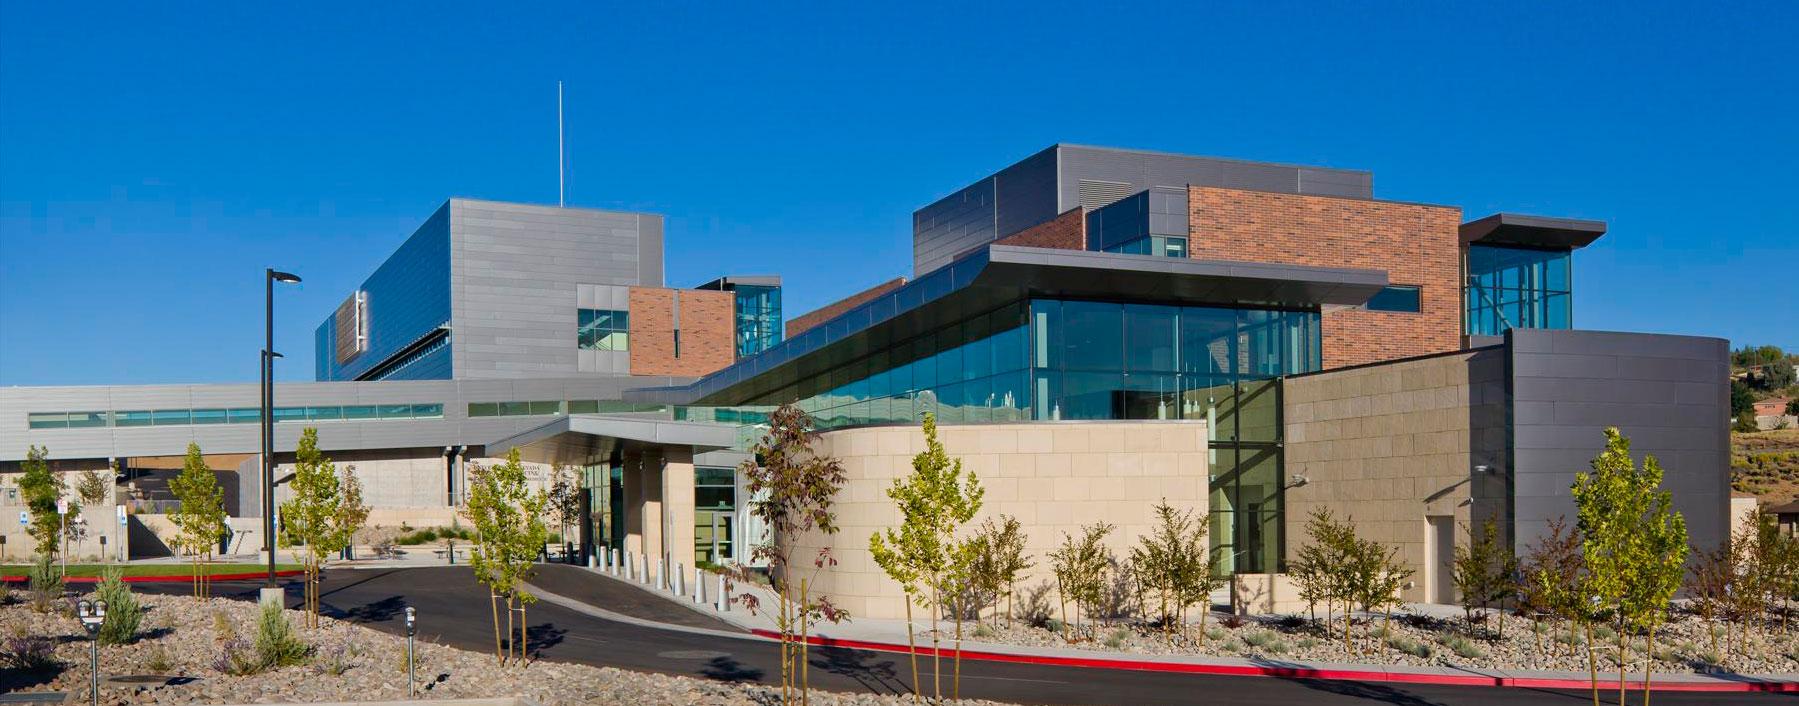 San Francisco Medical School